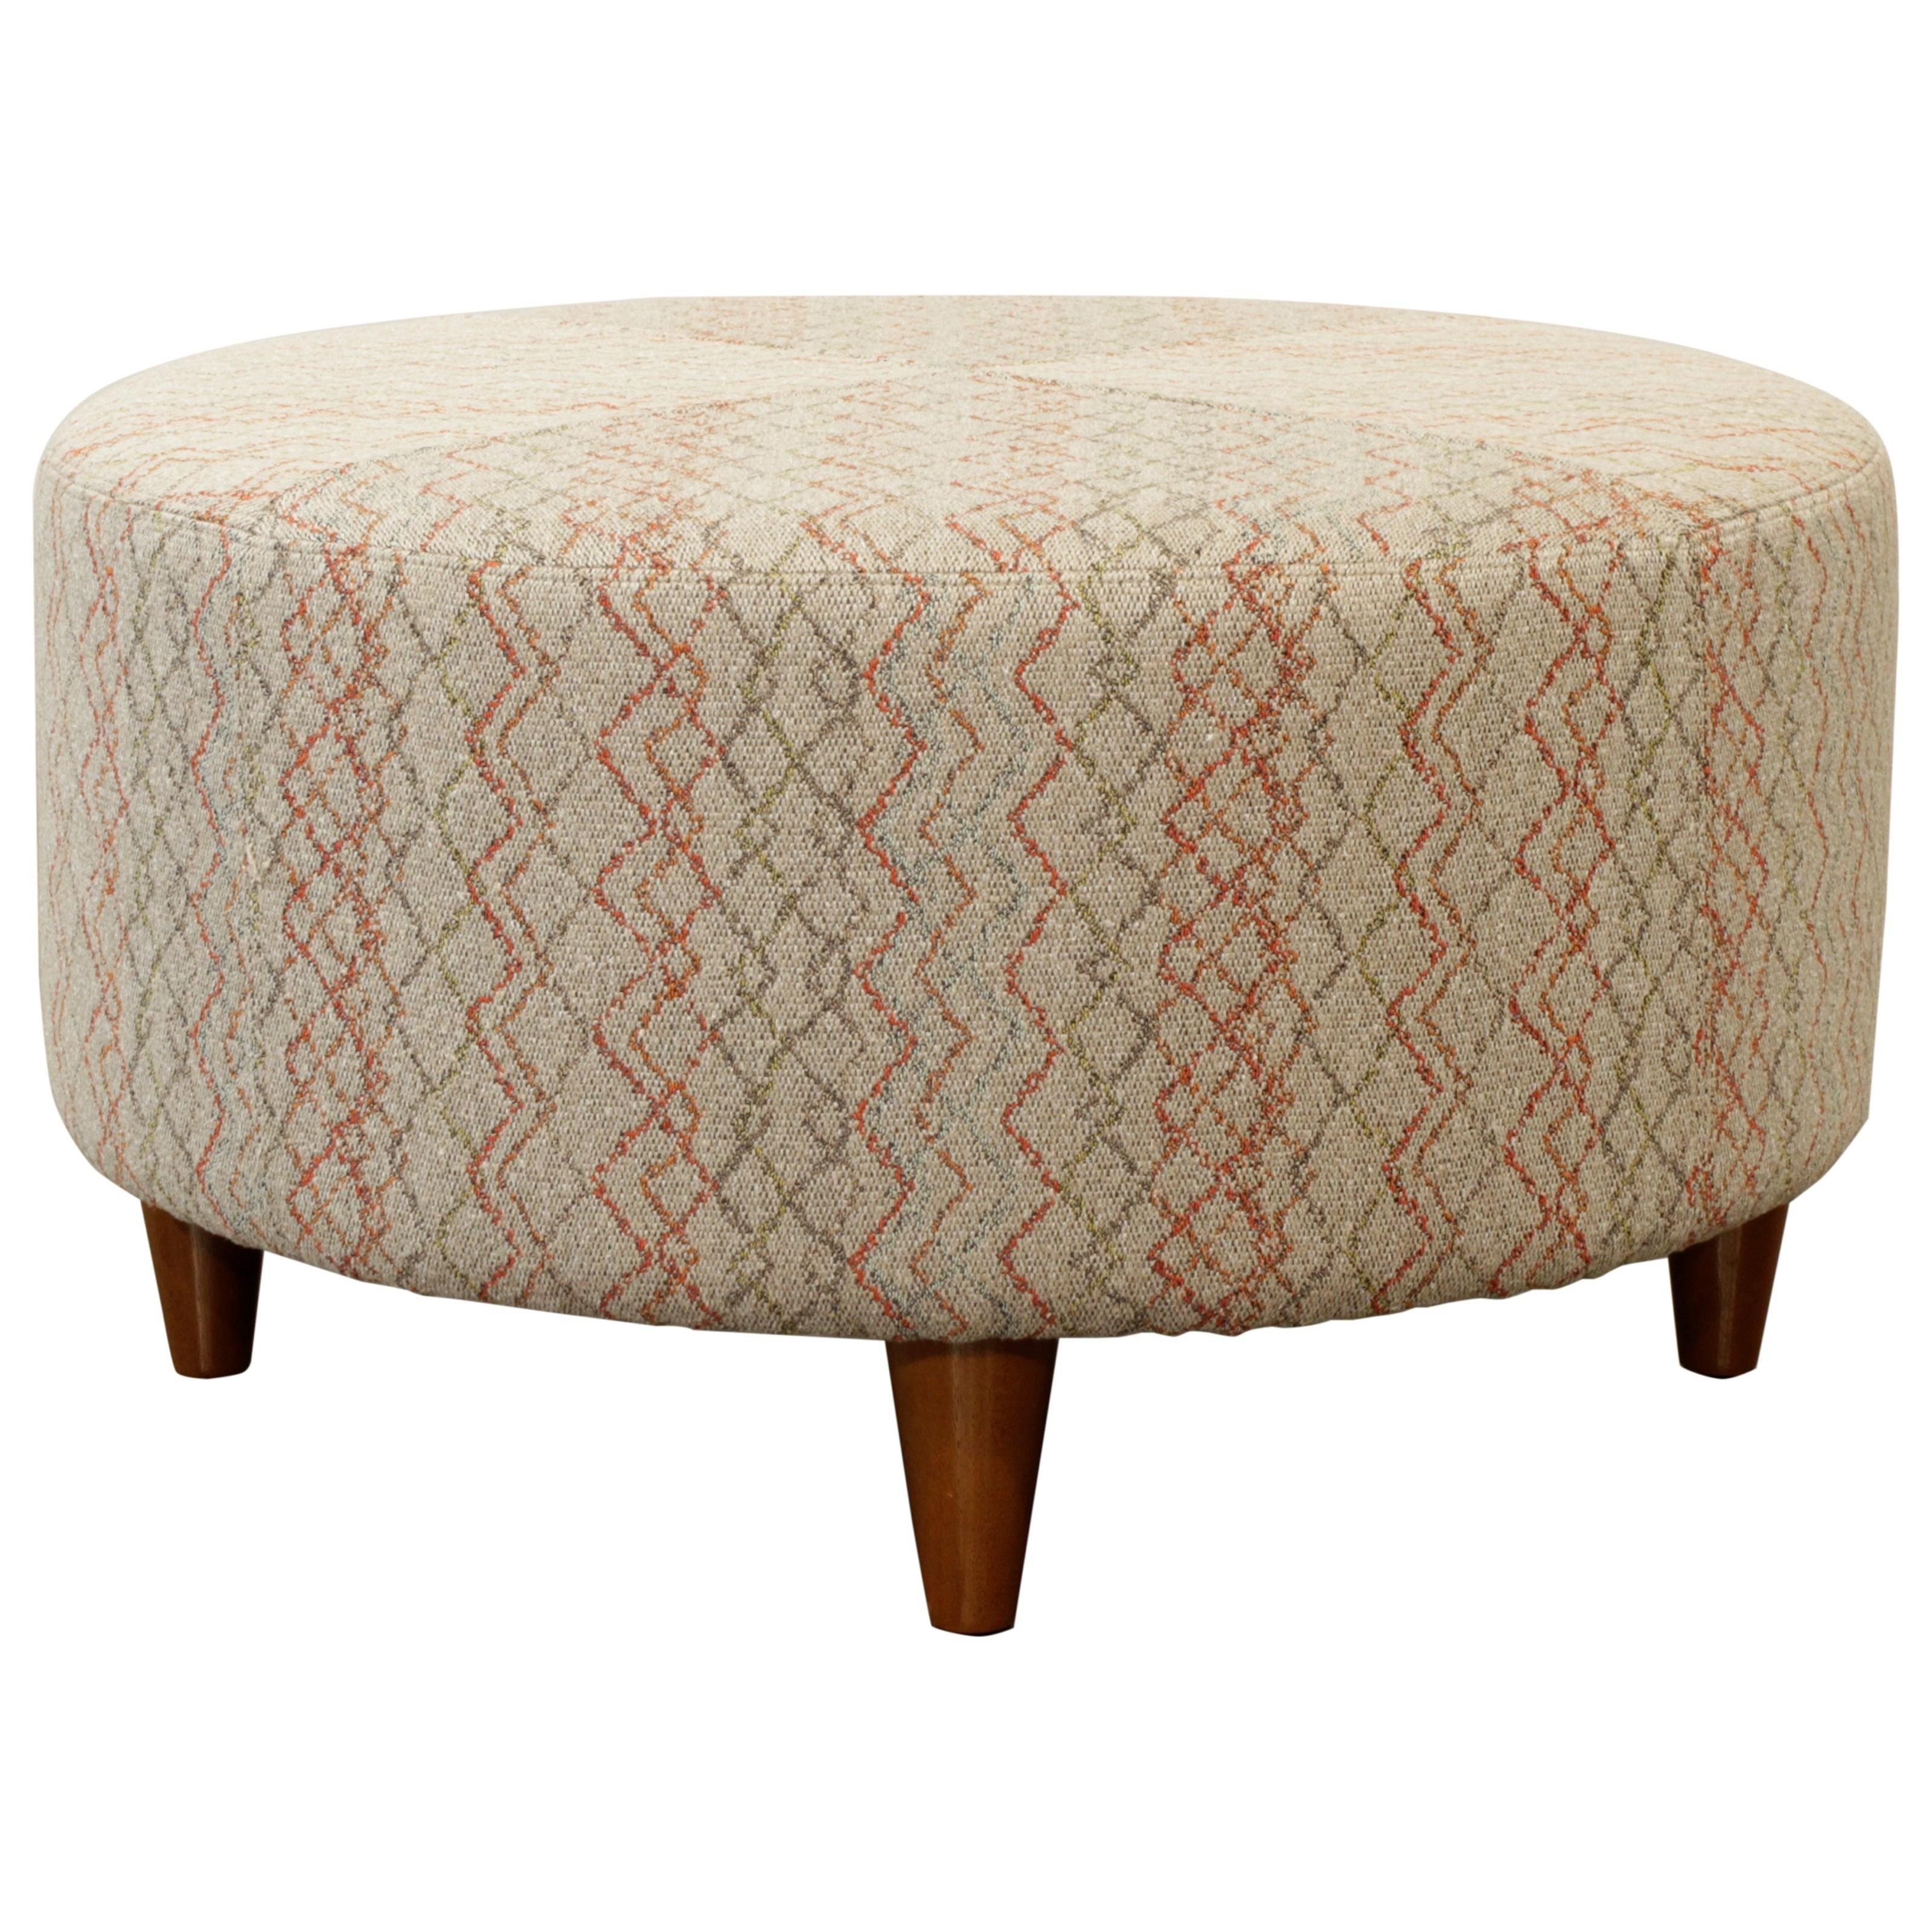 Chairs Ottoman by La-Z-Boy at HomeWorld Furniture